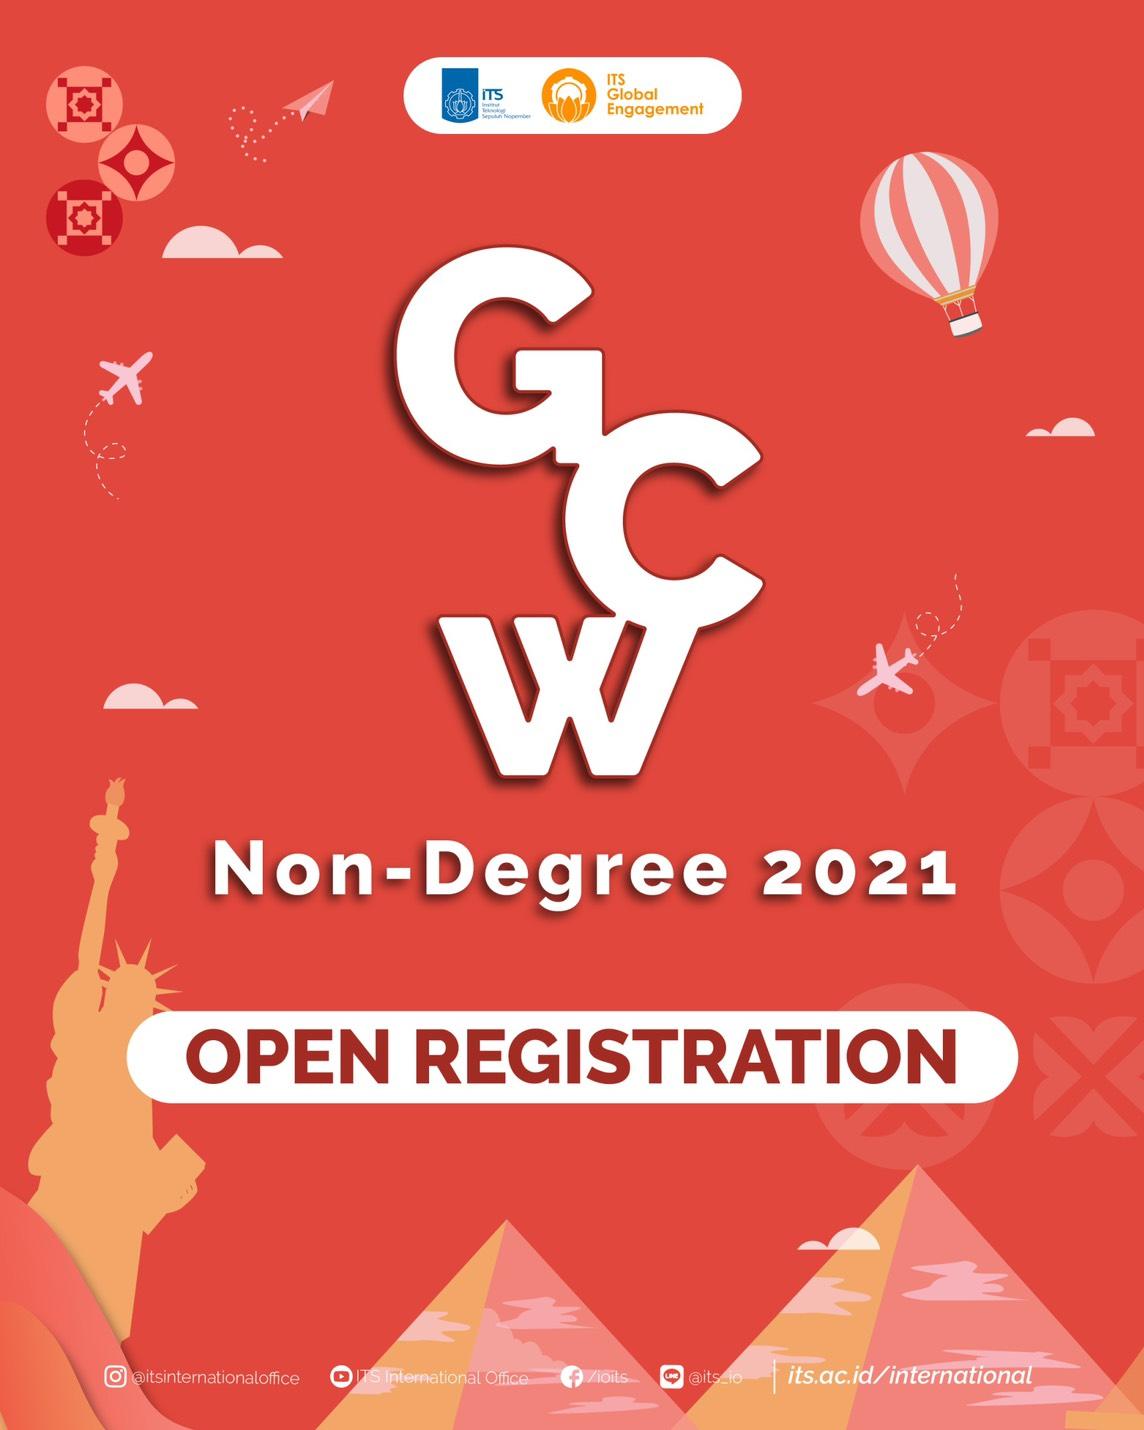 [GCW Non Degree 2021 Open Registration]